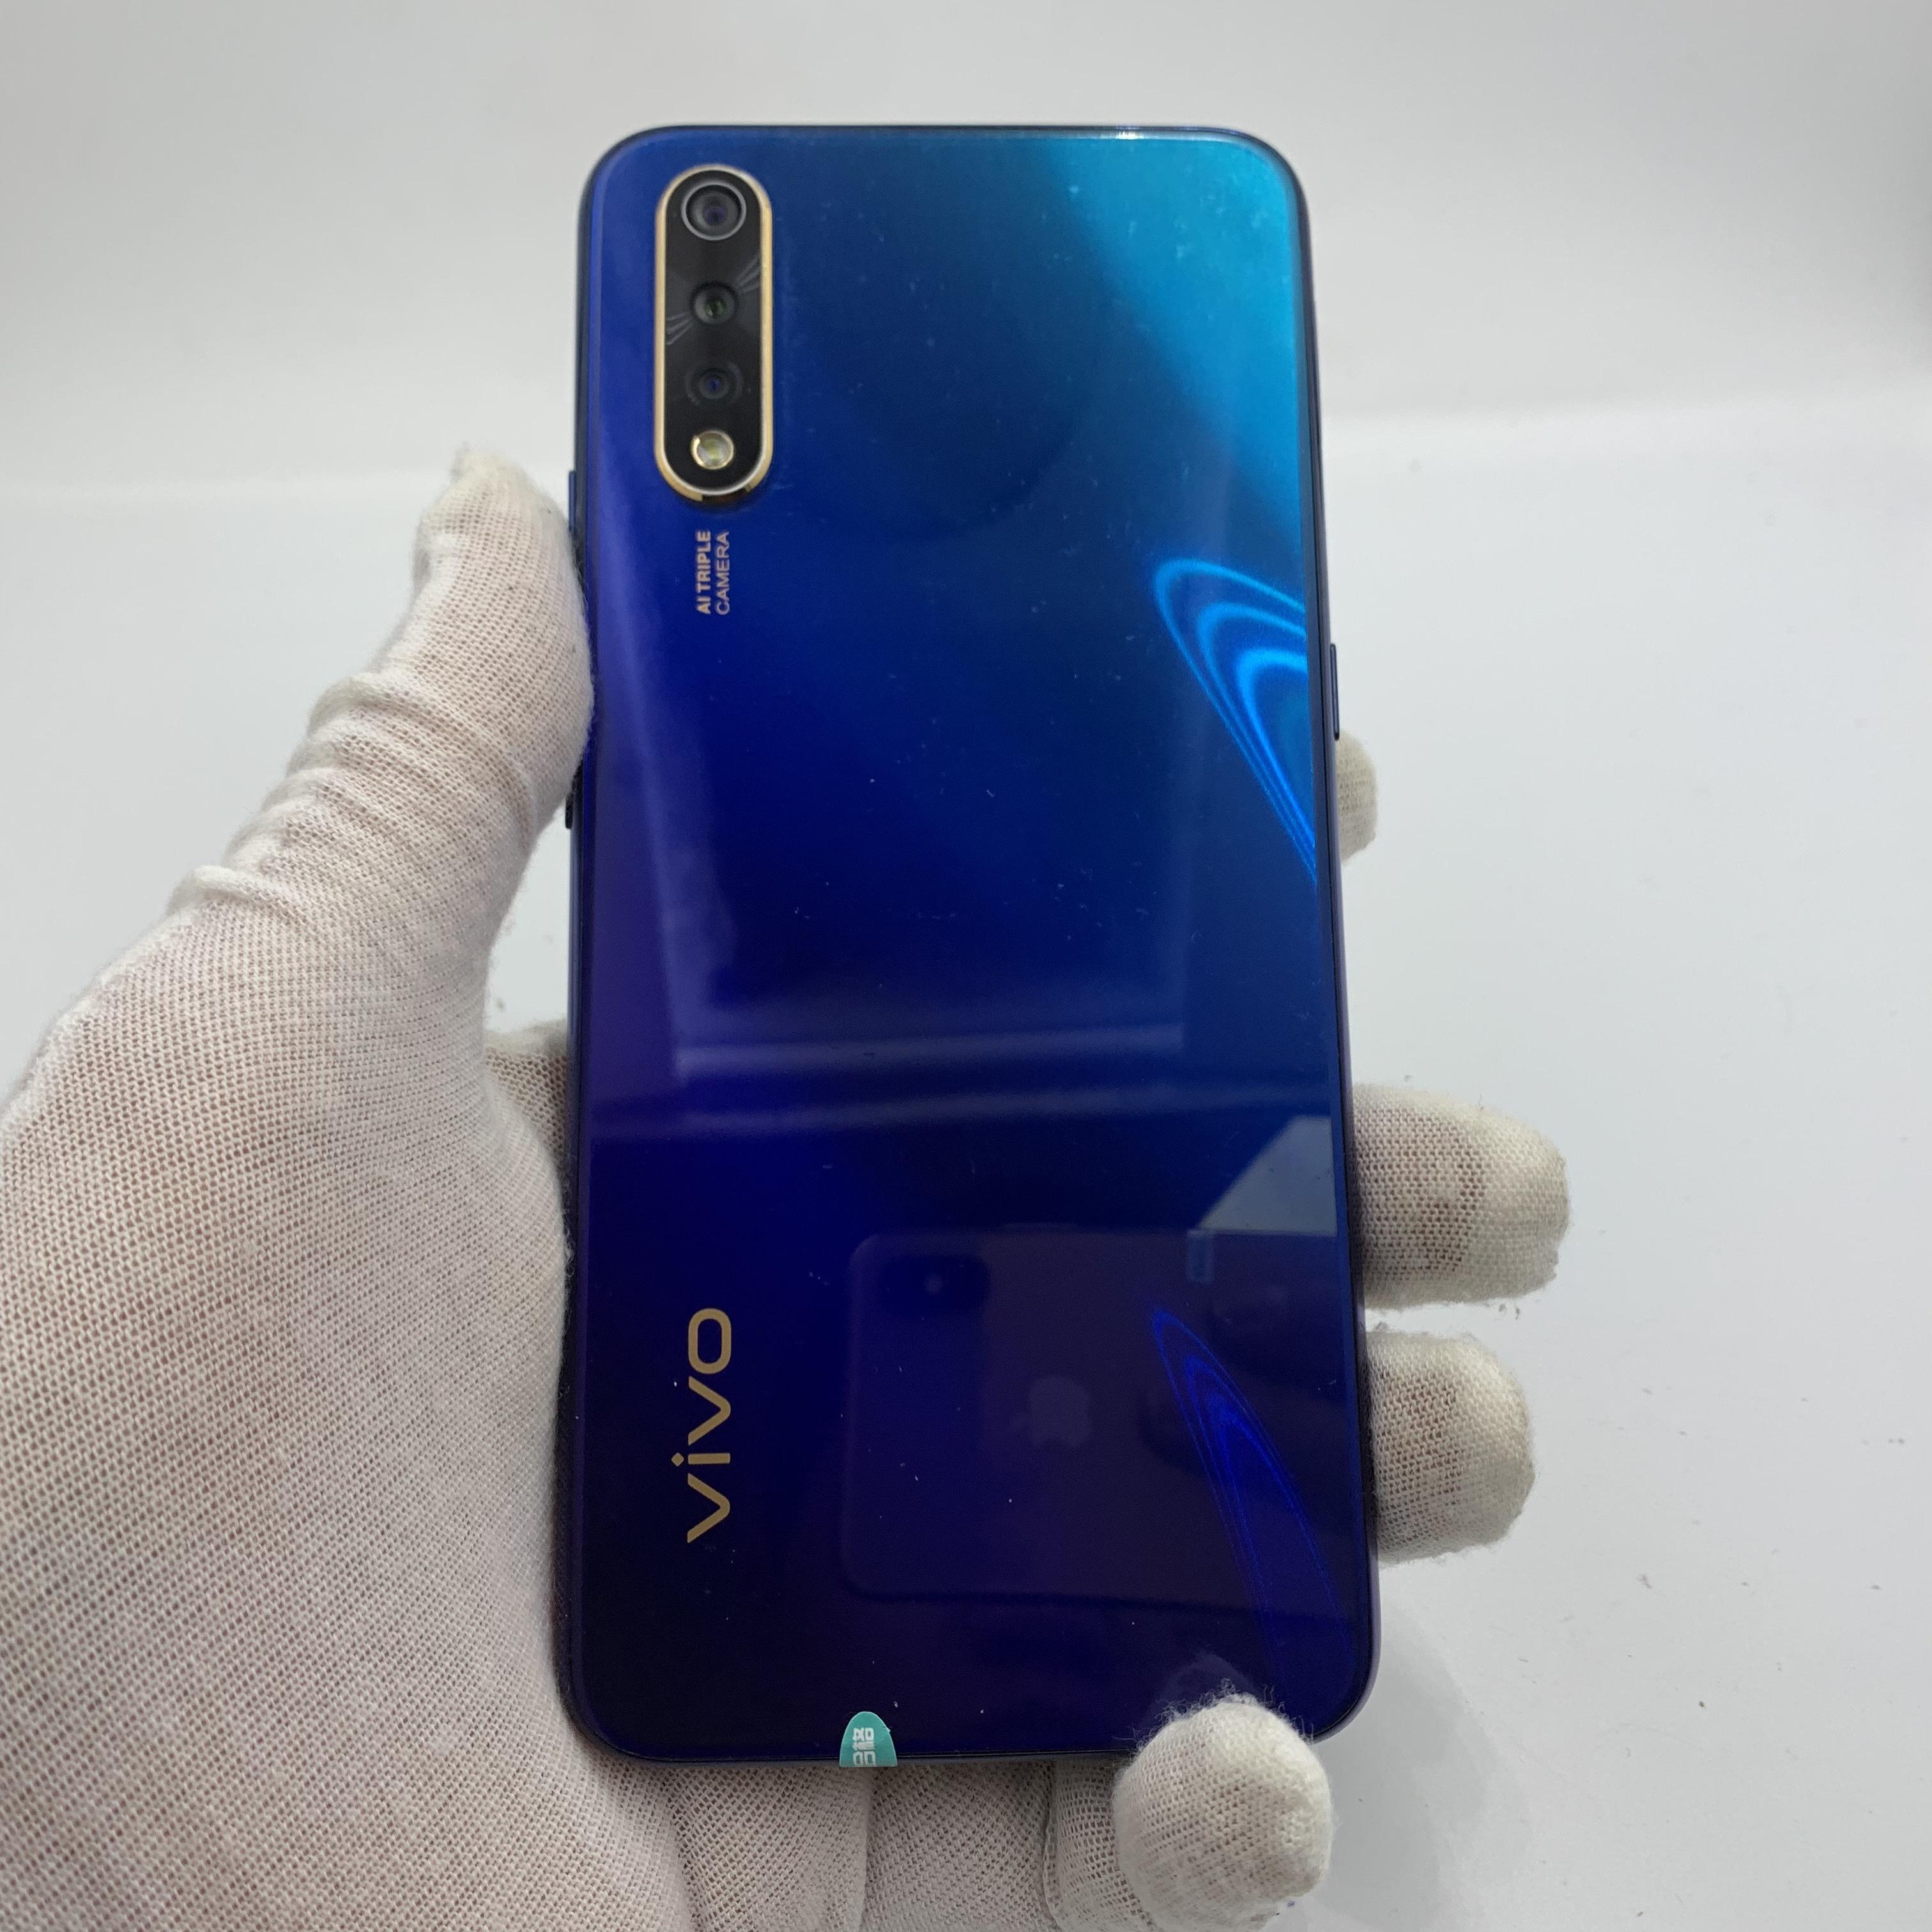 vivo【Y7s】4G全网通 蓝色 6G/128G 国行 8成新